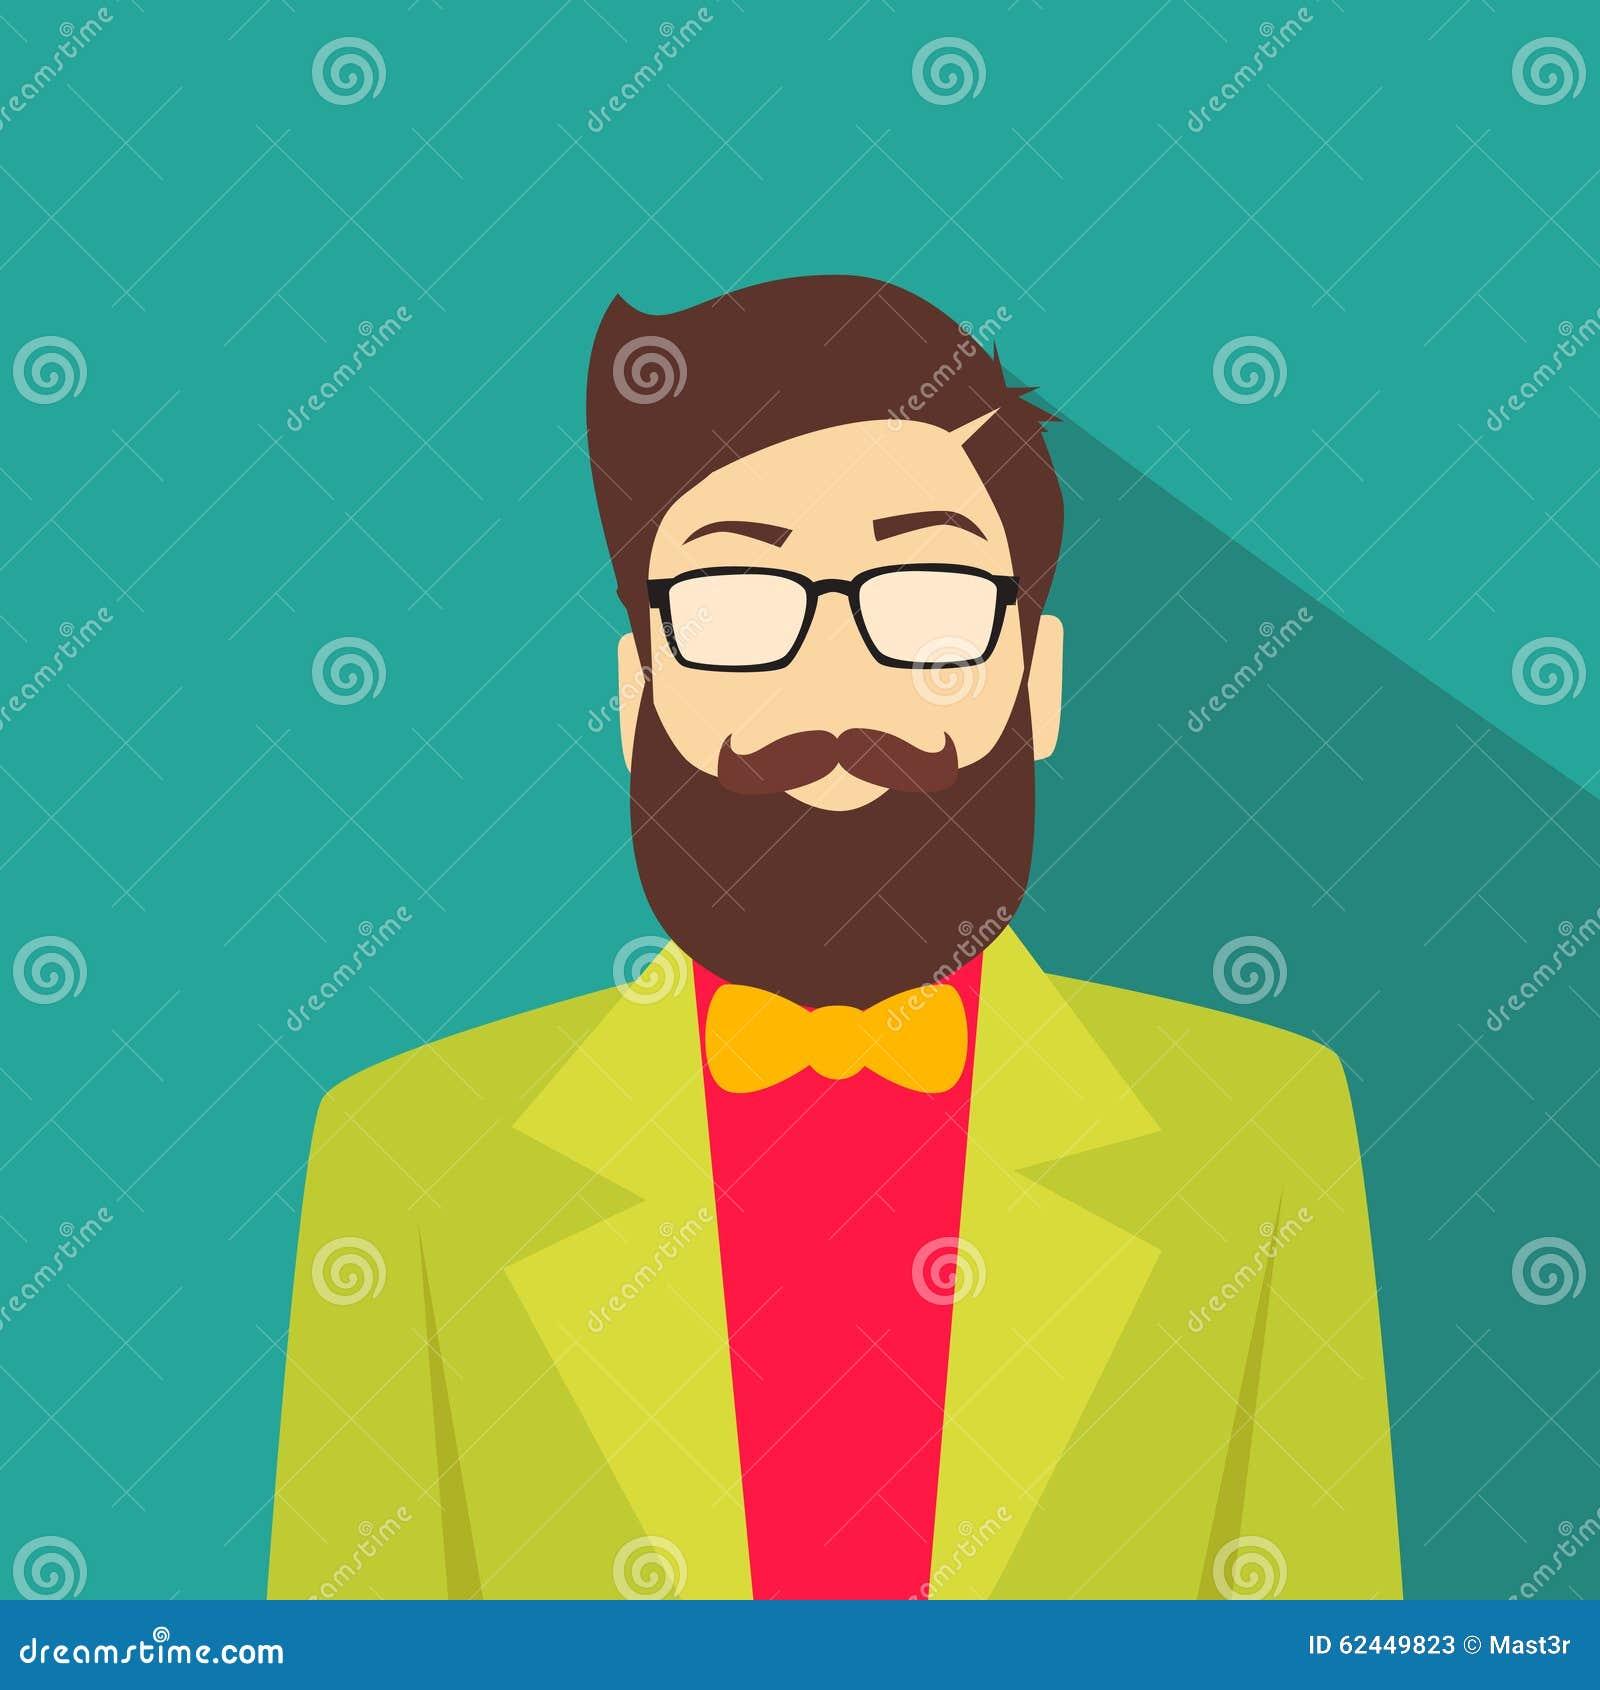 Profile Avatar: Profile Icon Male Avatar Man Hipster Style Fashion Stock